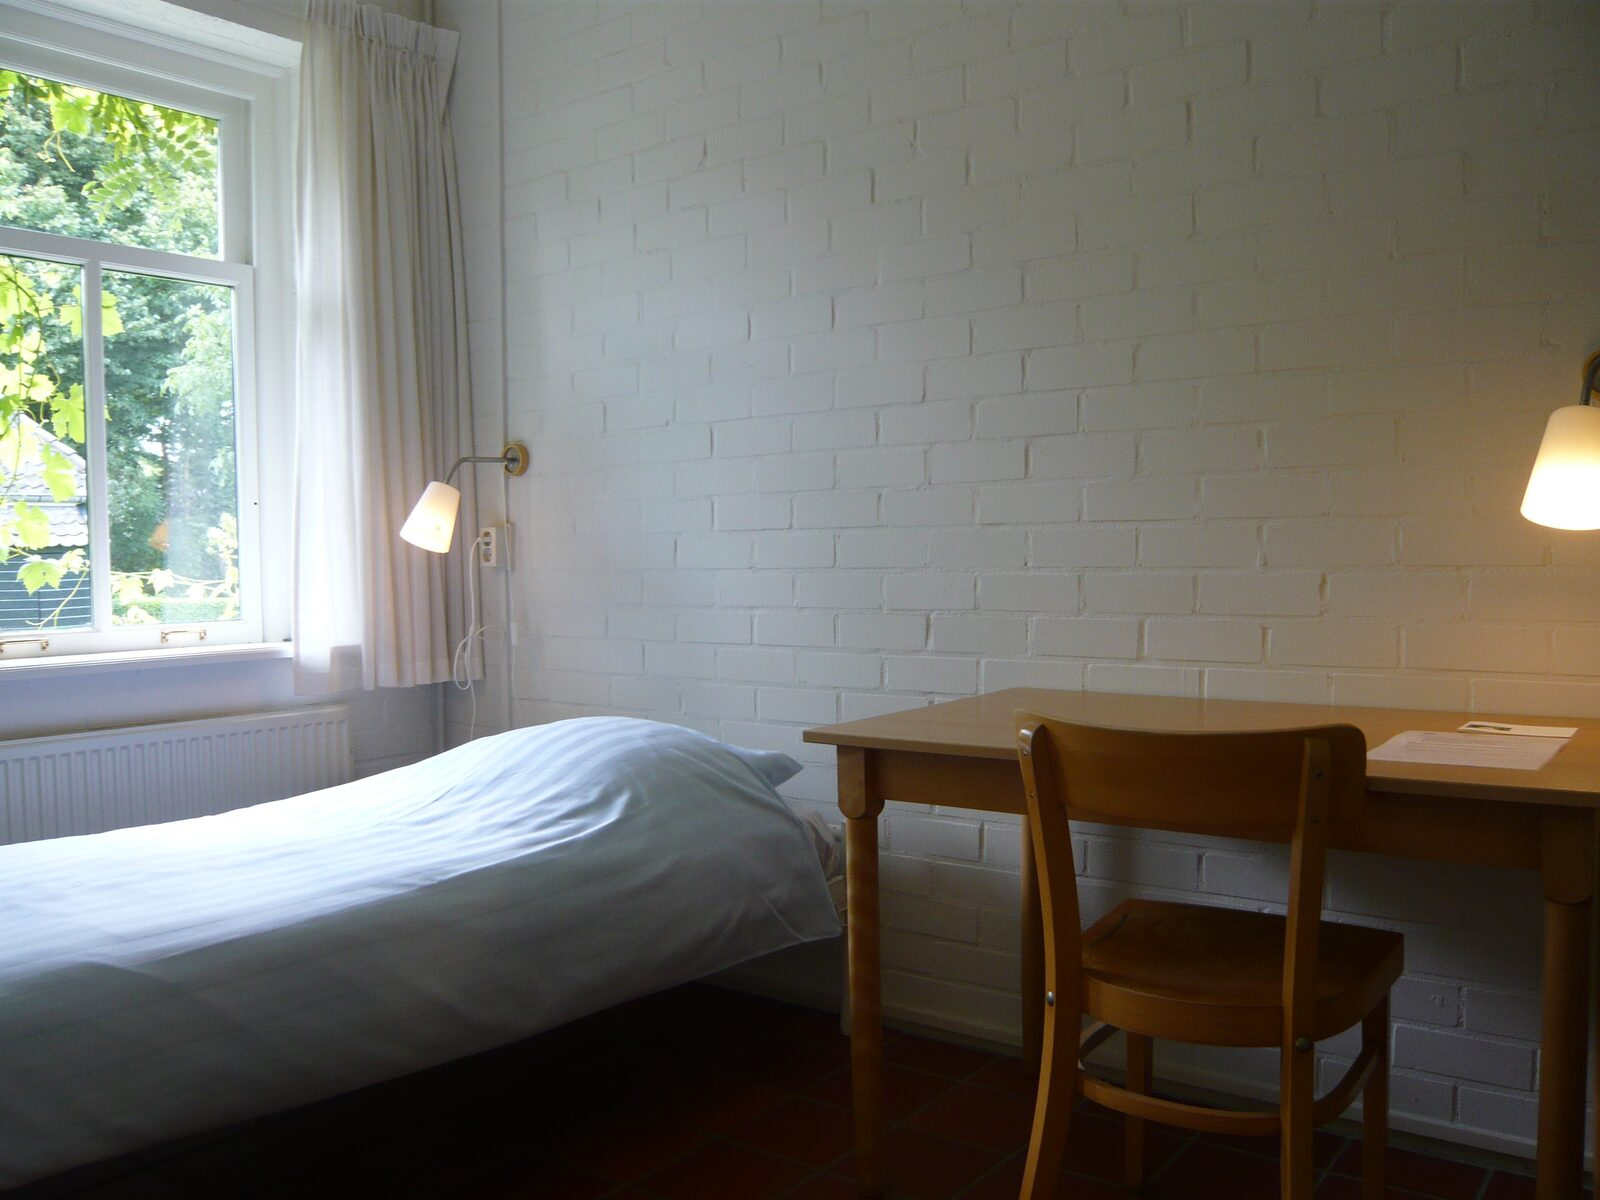 slaapkamer met tafel en stoel